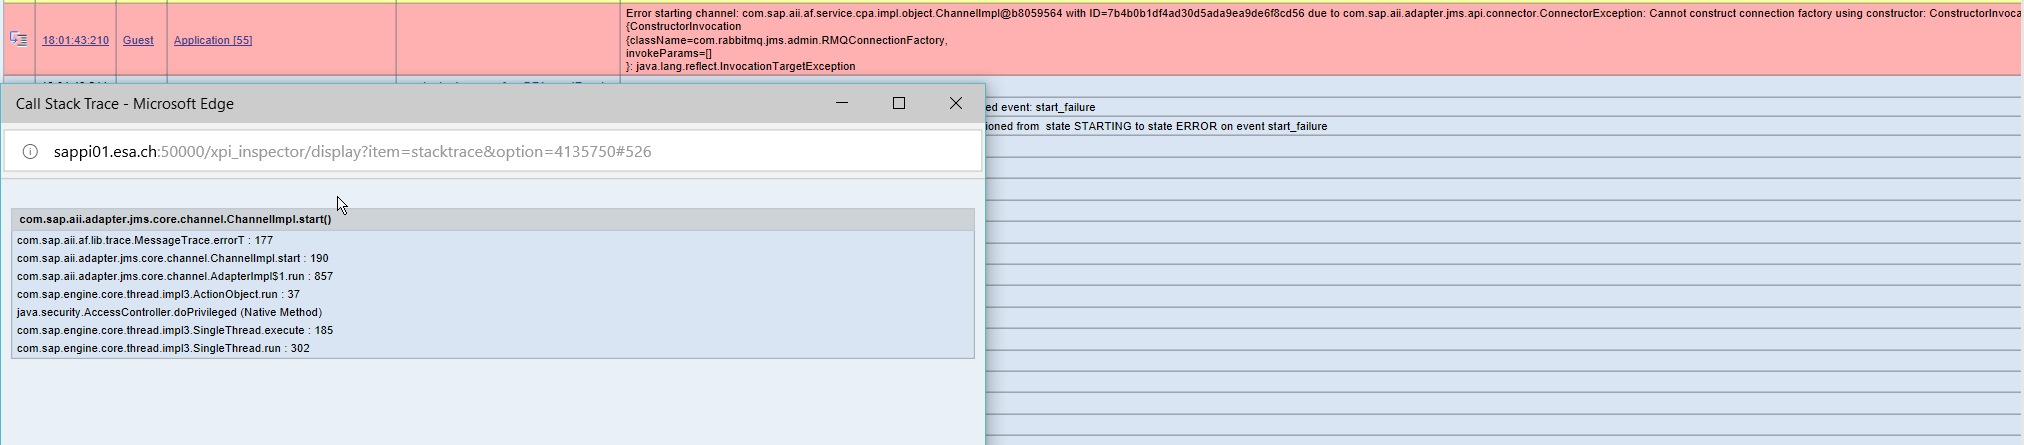 Integration of SAP PI/PO with RabbitMQ AMQP Broker via JMS | SAP Blogs